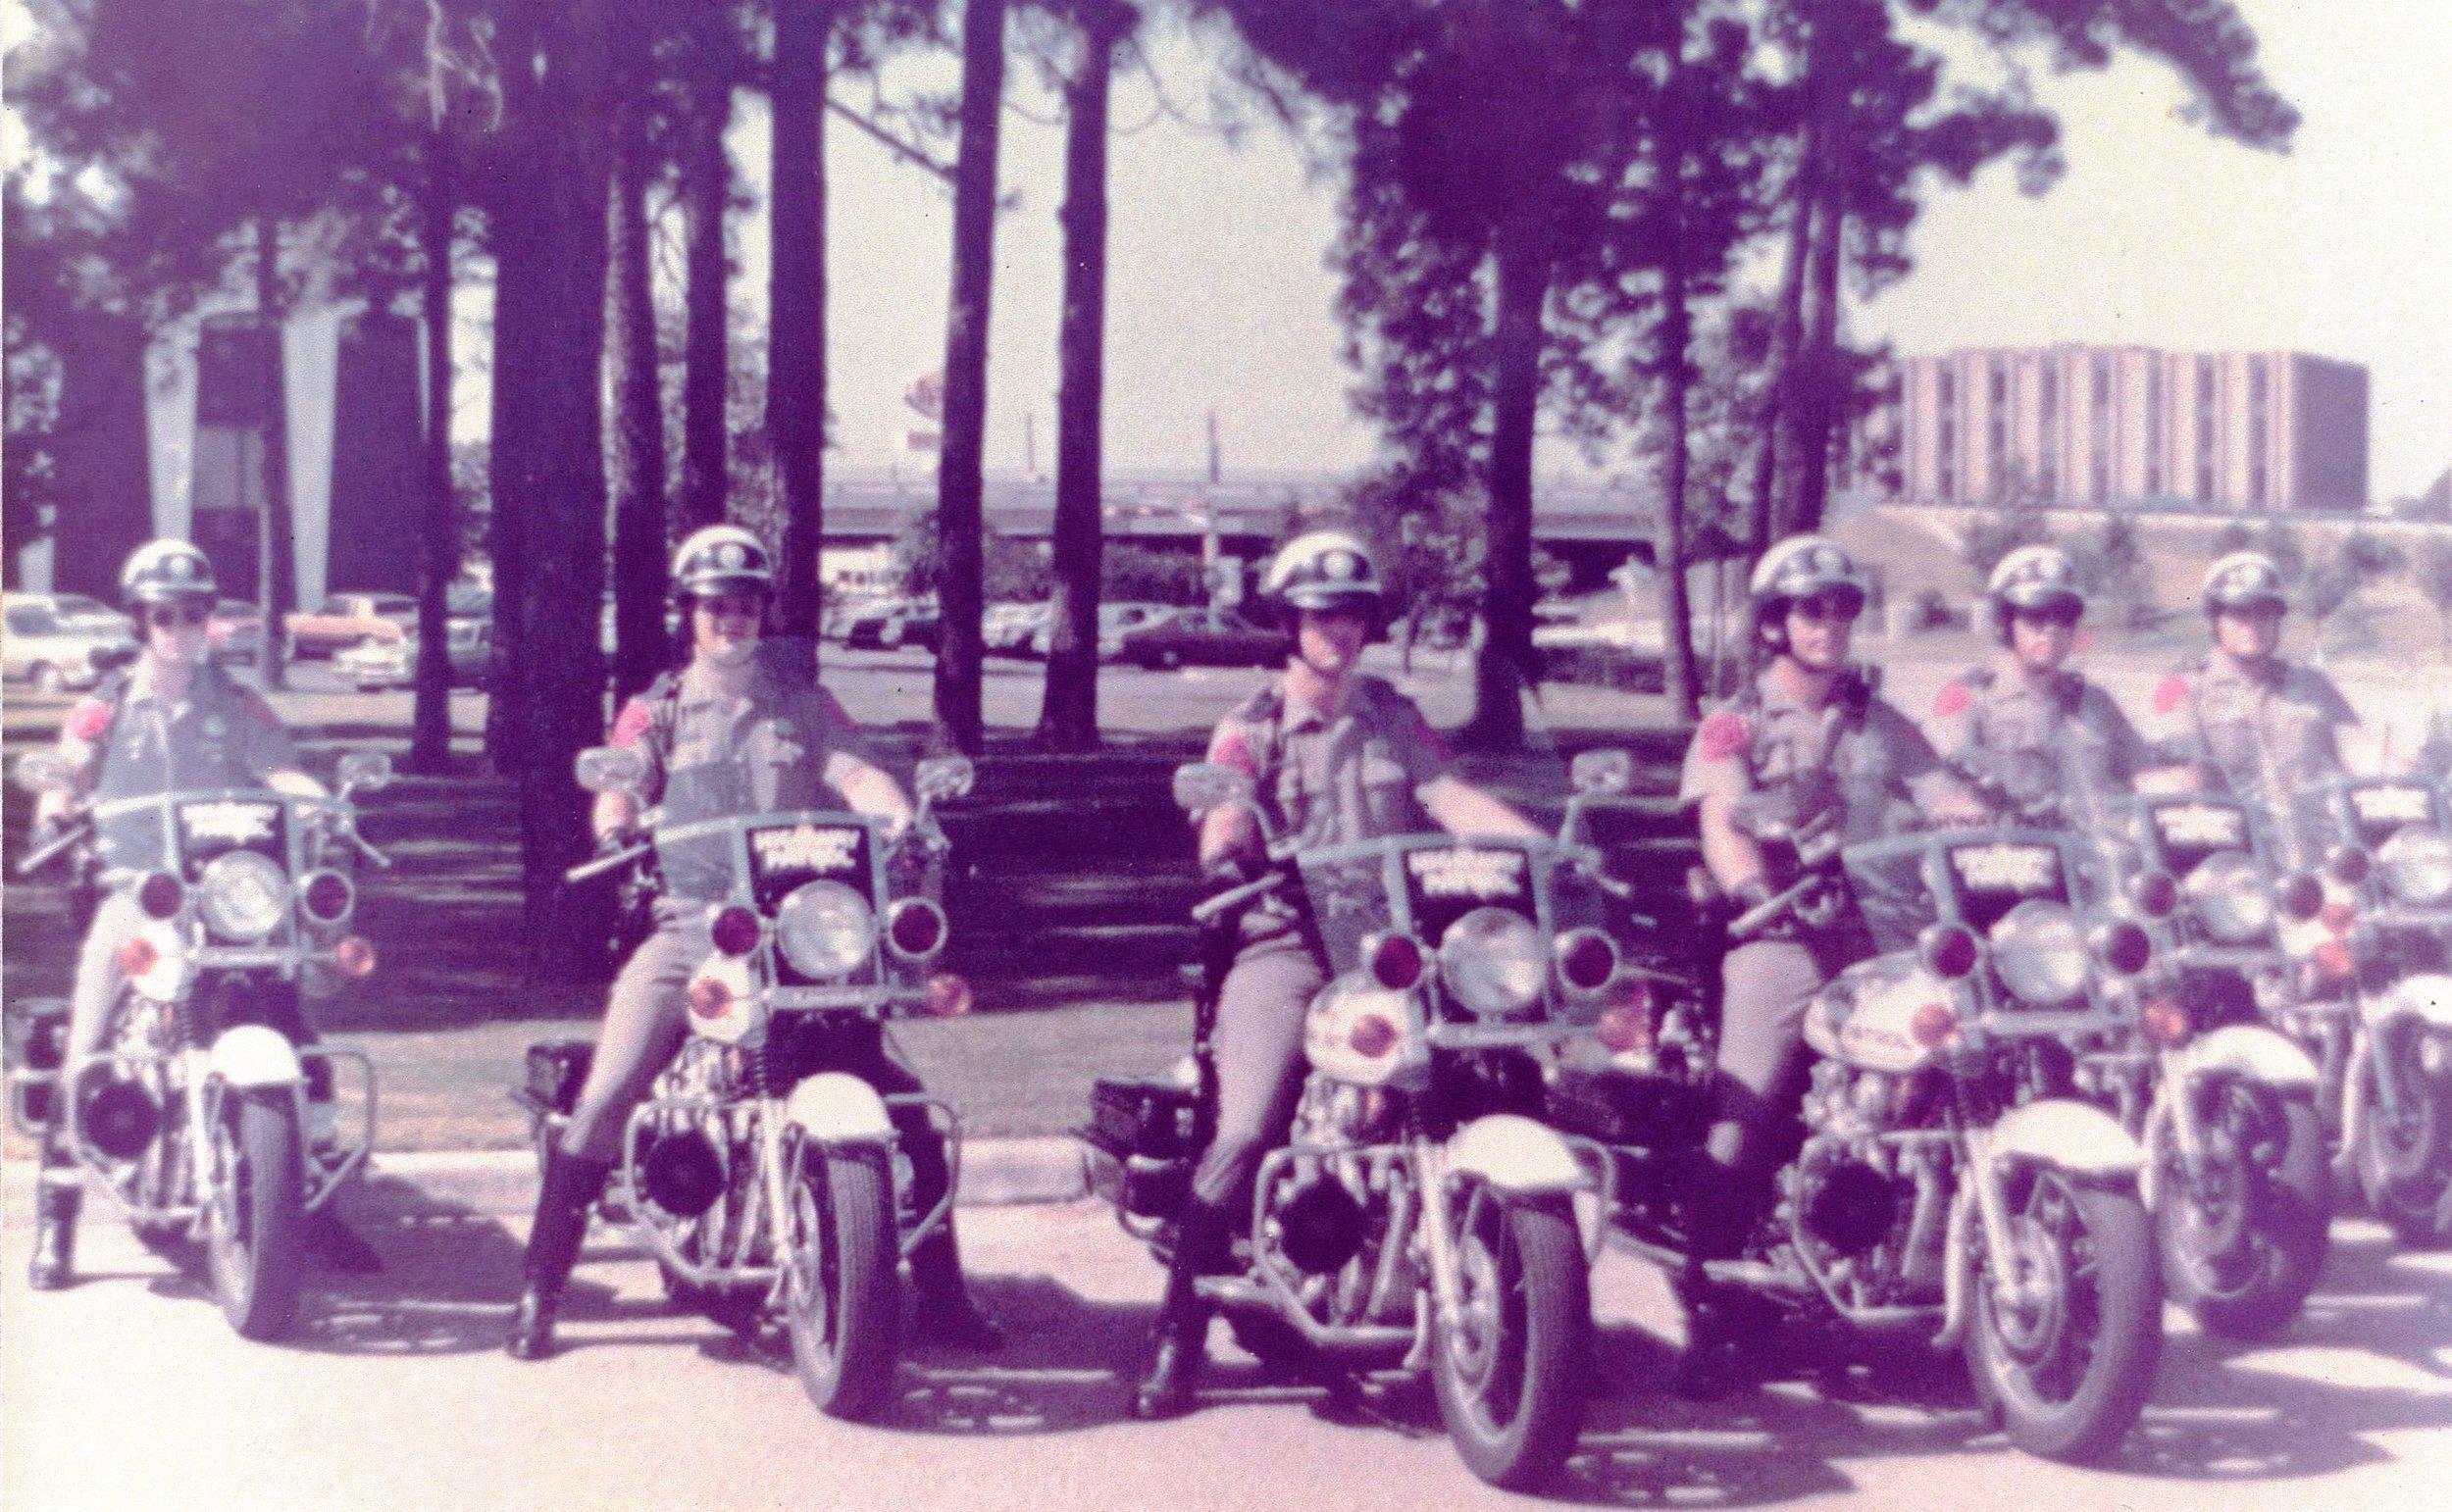 1970s DPS Motorcycle Unit Houston.jpg